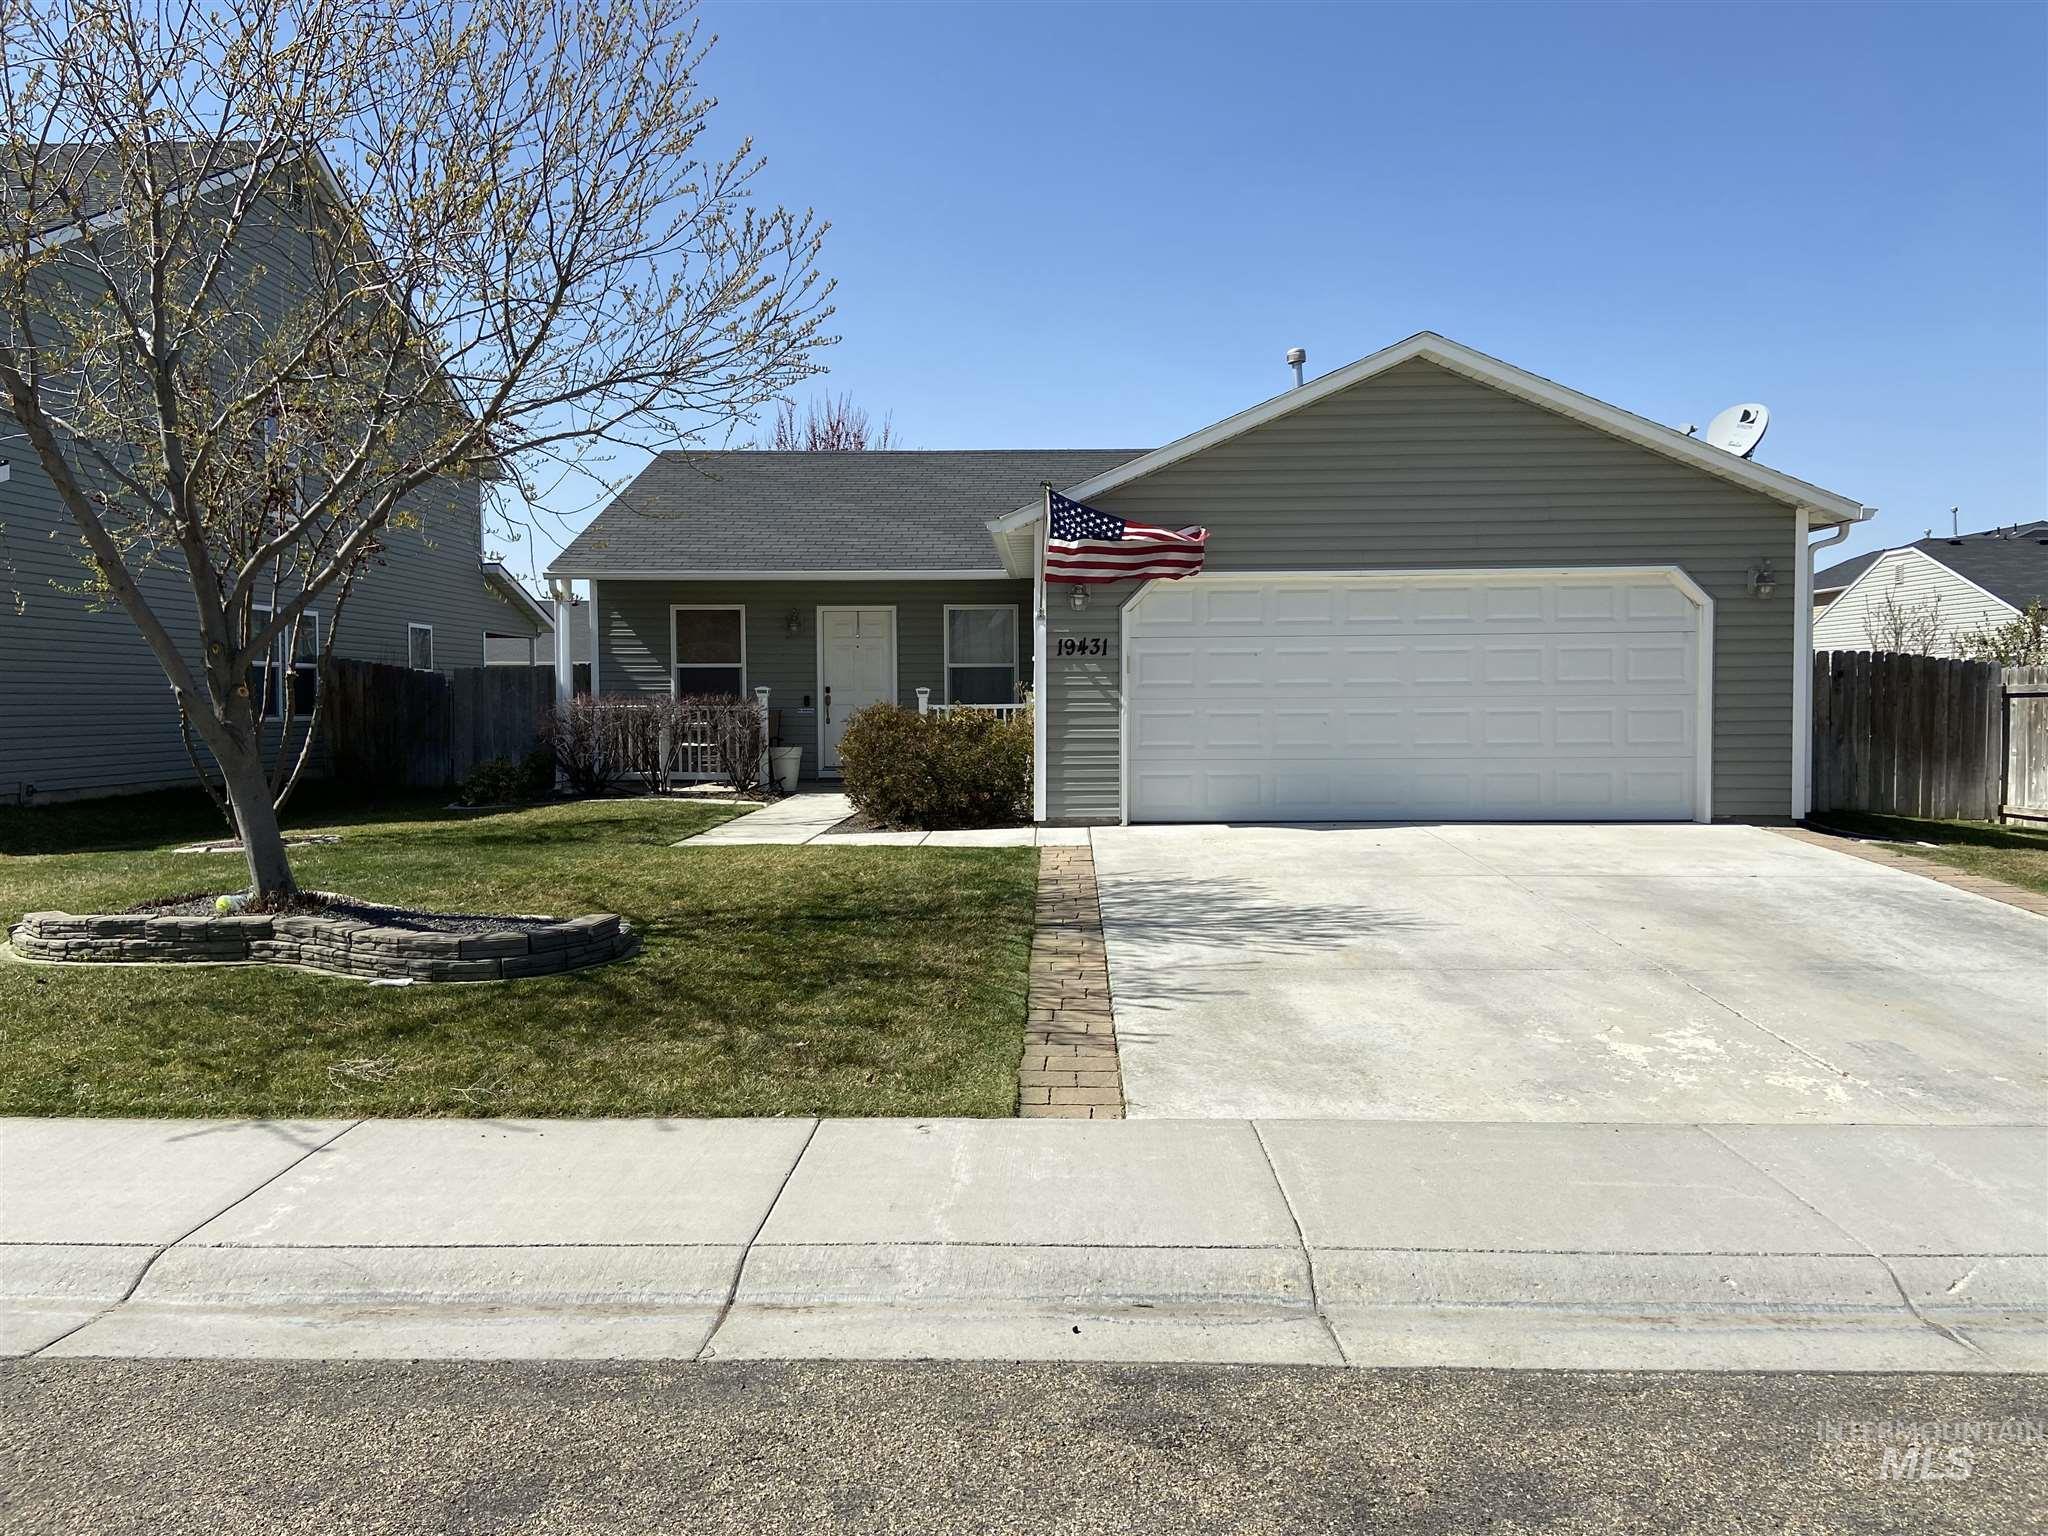 19431 Brush Creek Ave Property Photo - Caldwell, ID real estate listing